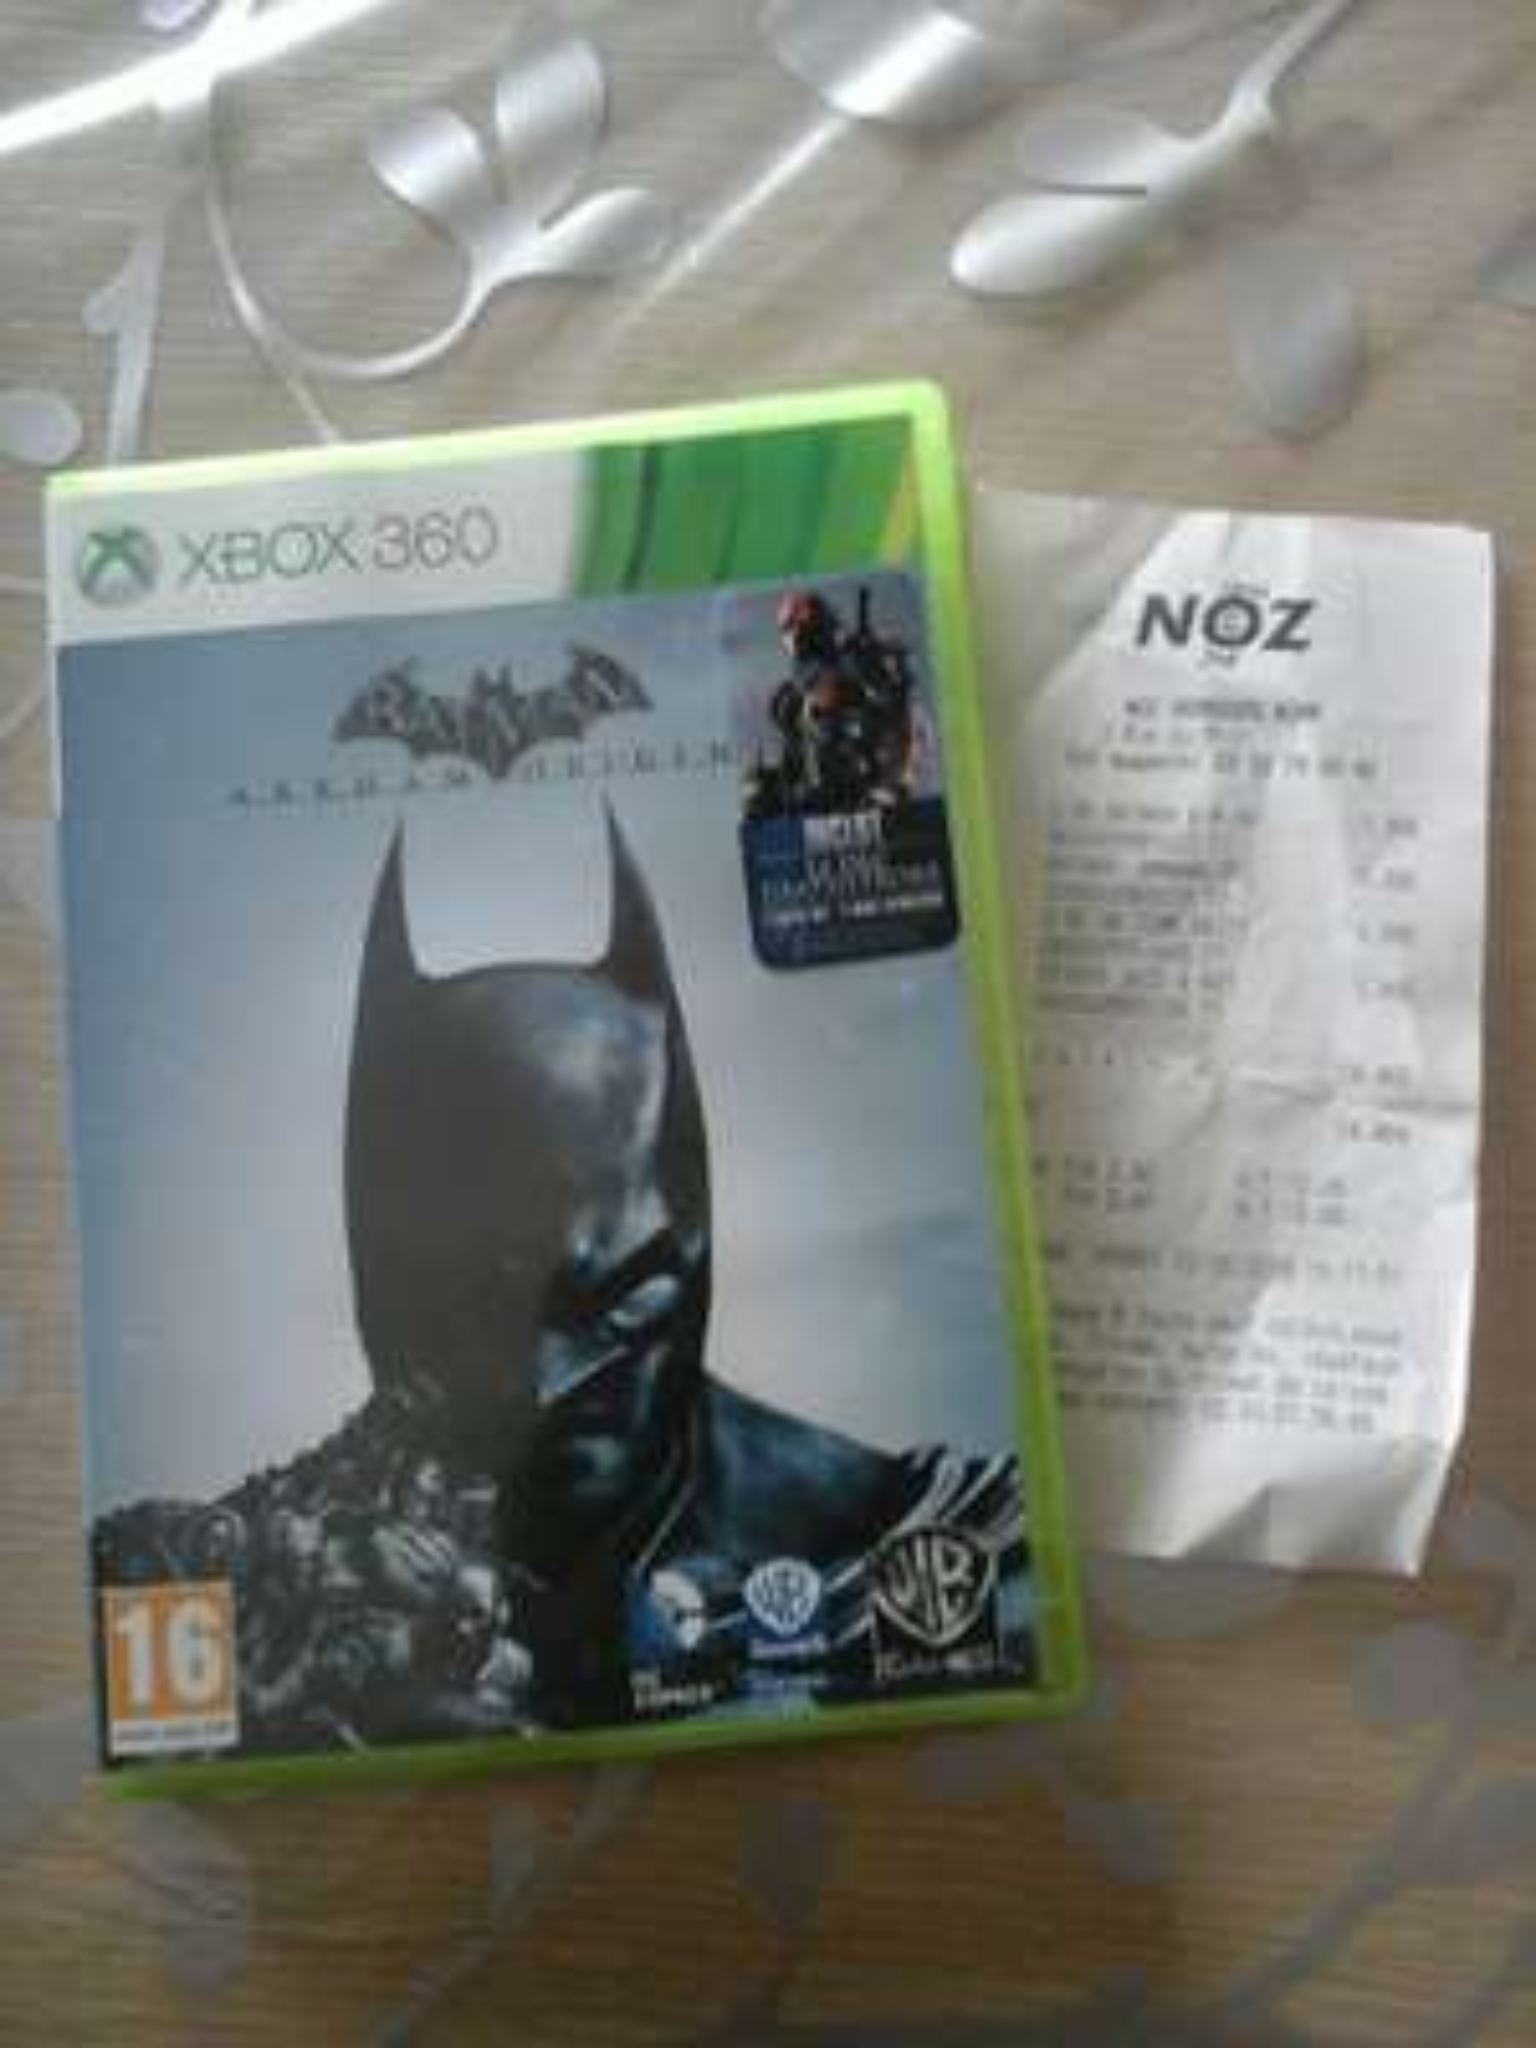 Batman - Arkham Origins sur Xbox 360 (Horbourg-Wihr 68)